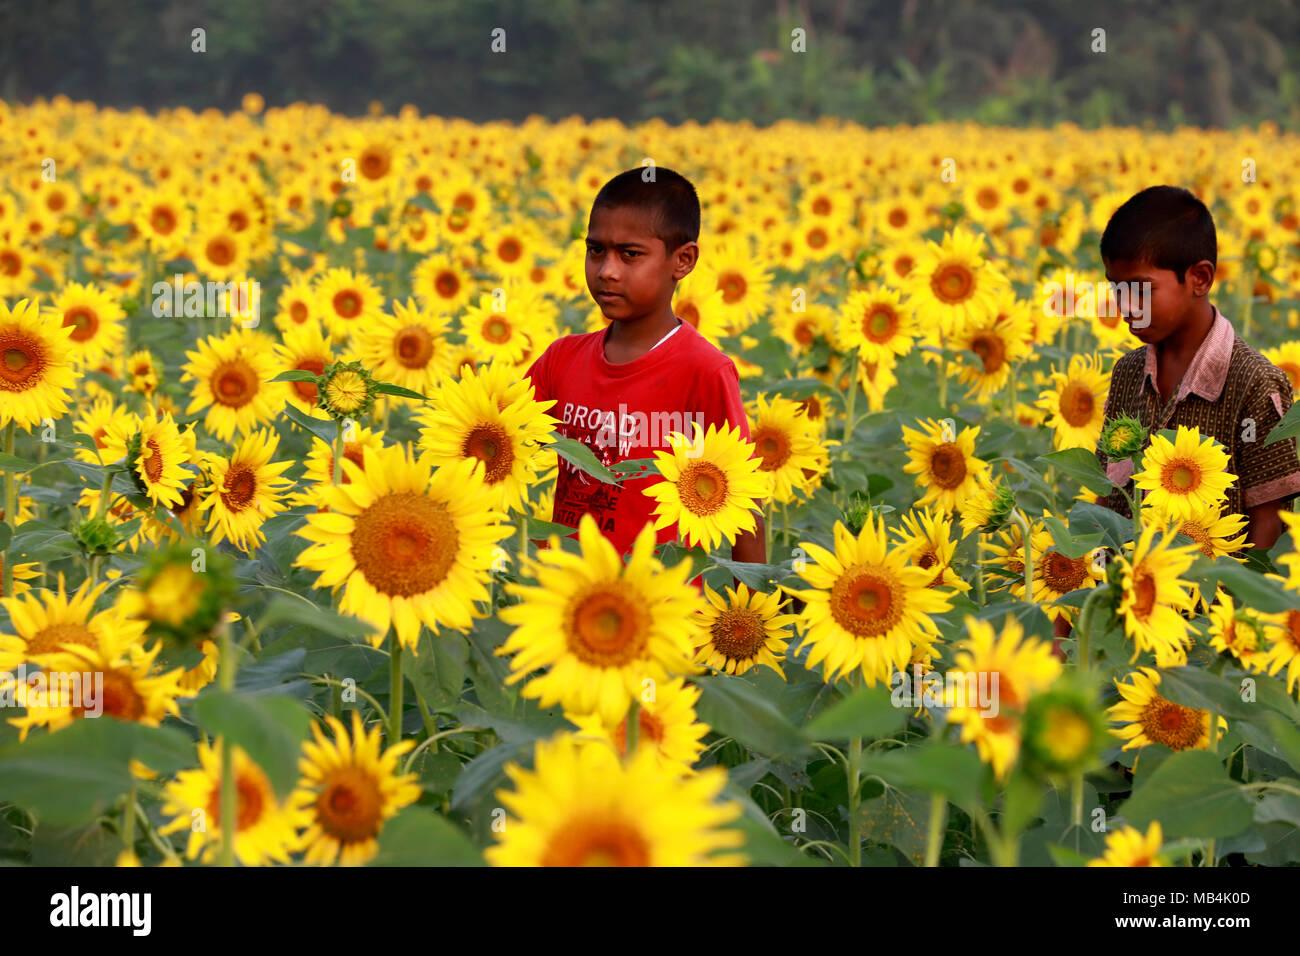 Noakhali, Bangladesh - April 06, 2018: Bangladeshi children play